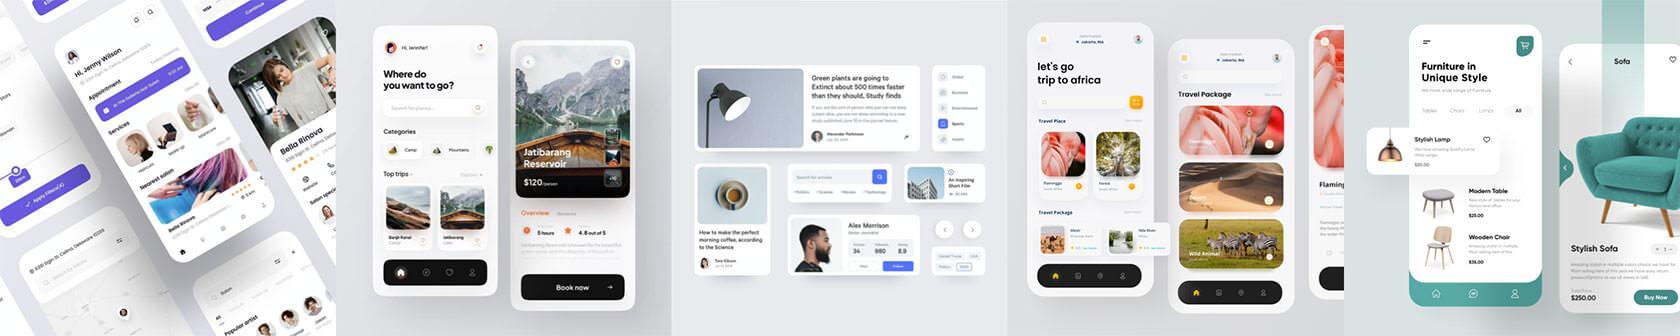 minimal-webdesign-guide-3